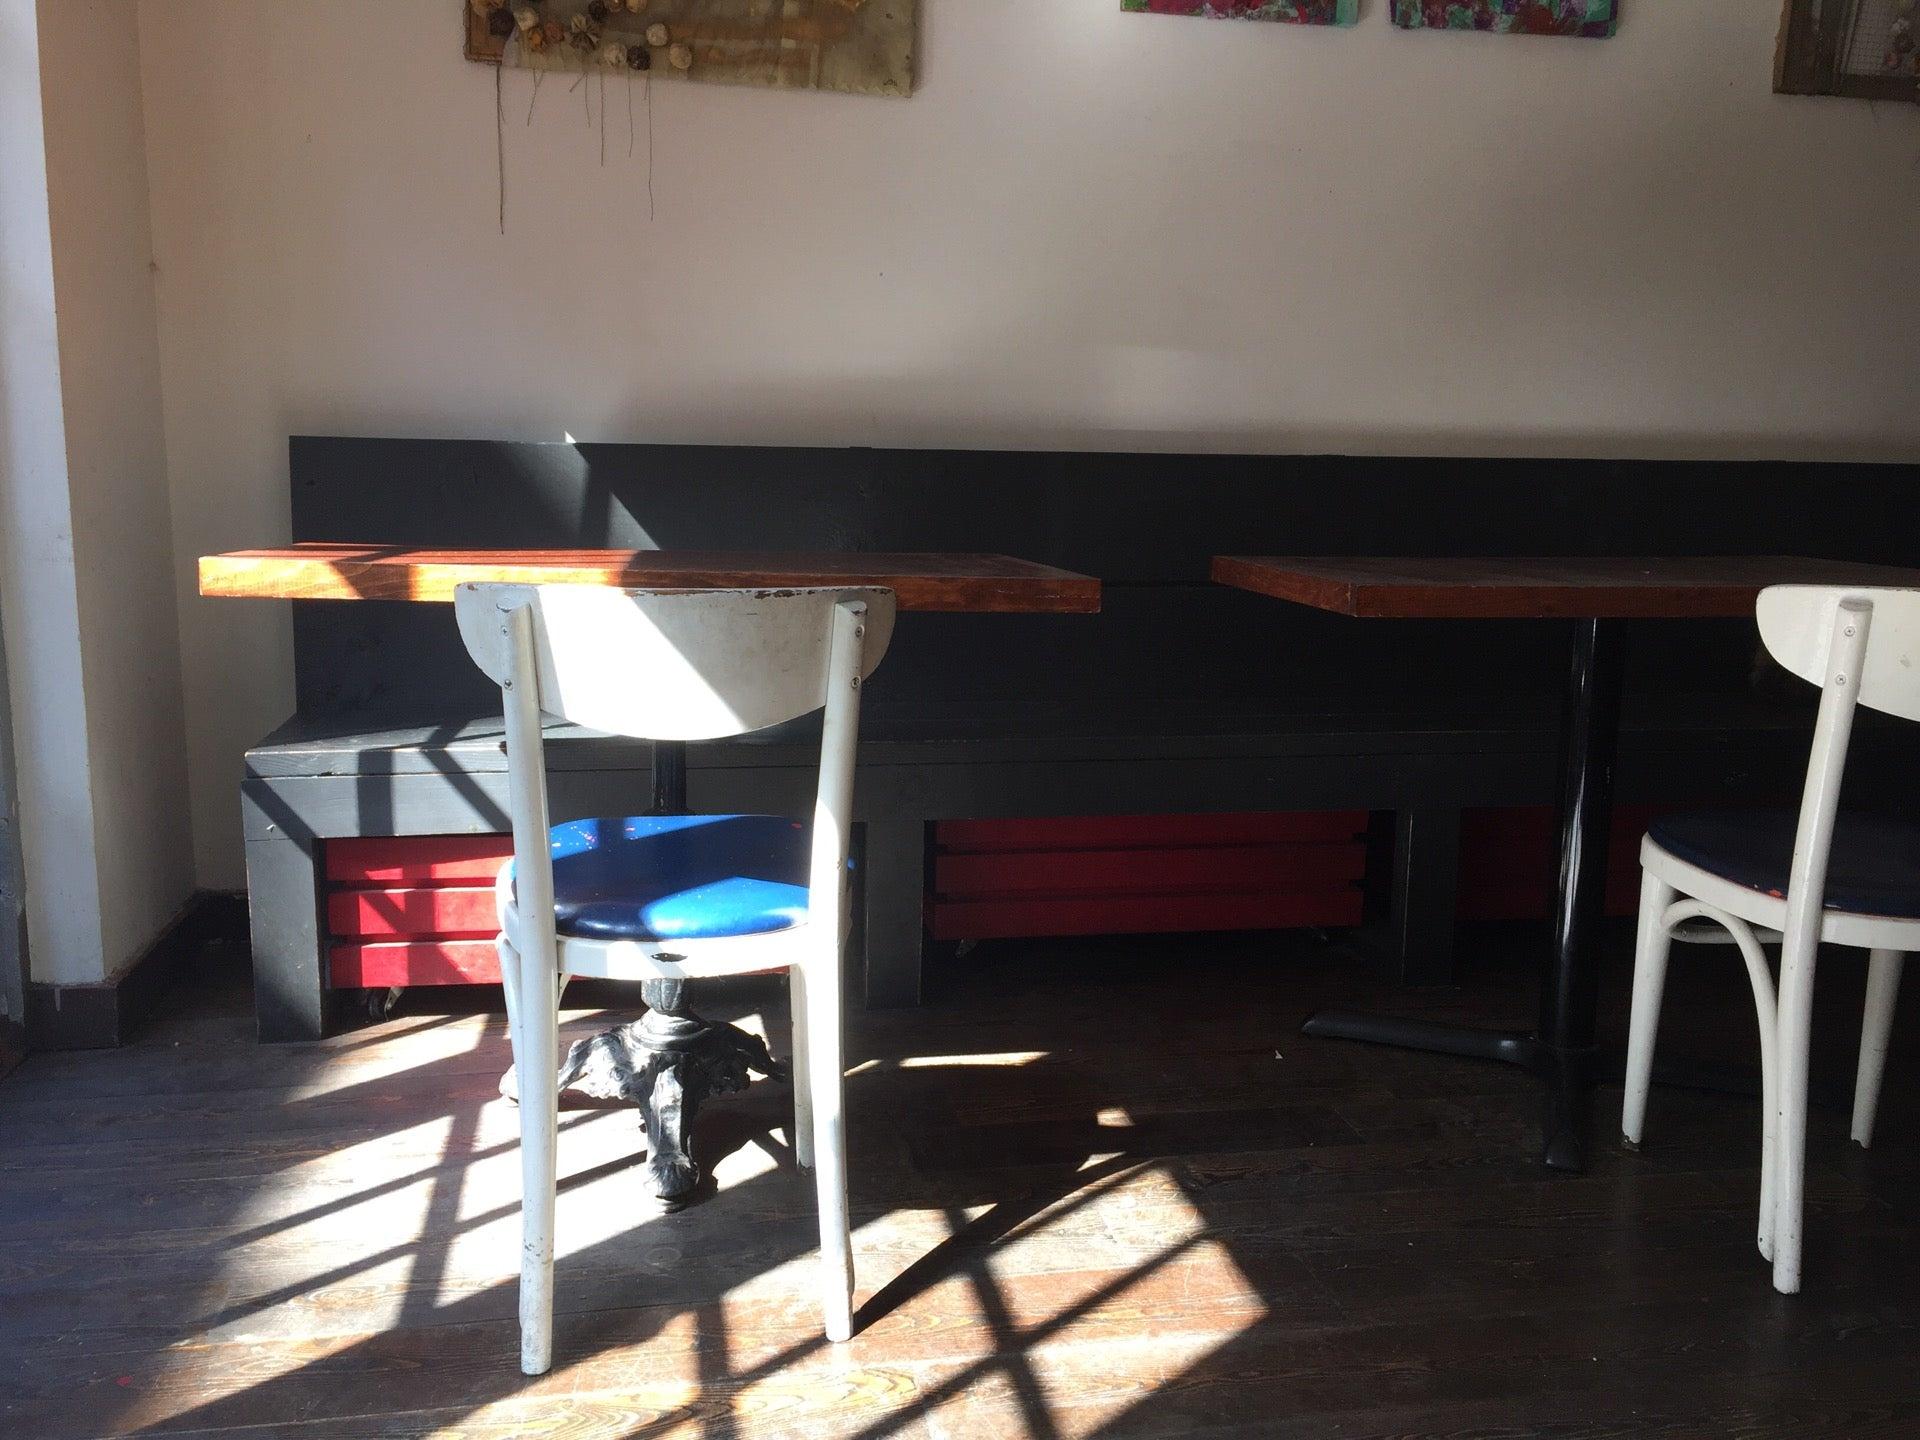 Brooklyn Kolache Co, breakfast tacos, coffee, wifi,kolaches